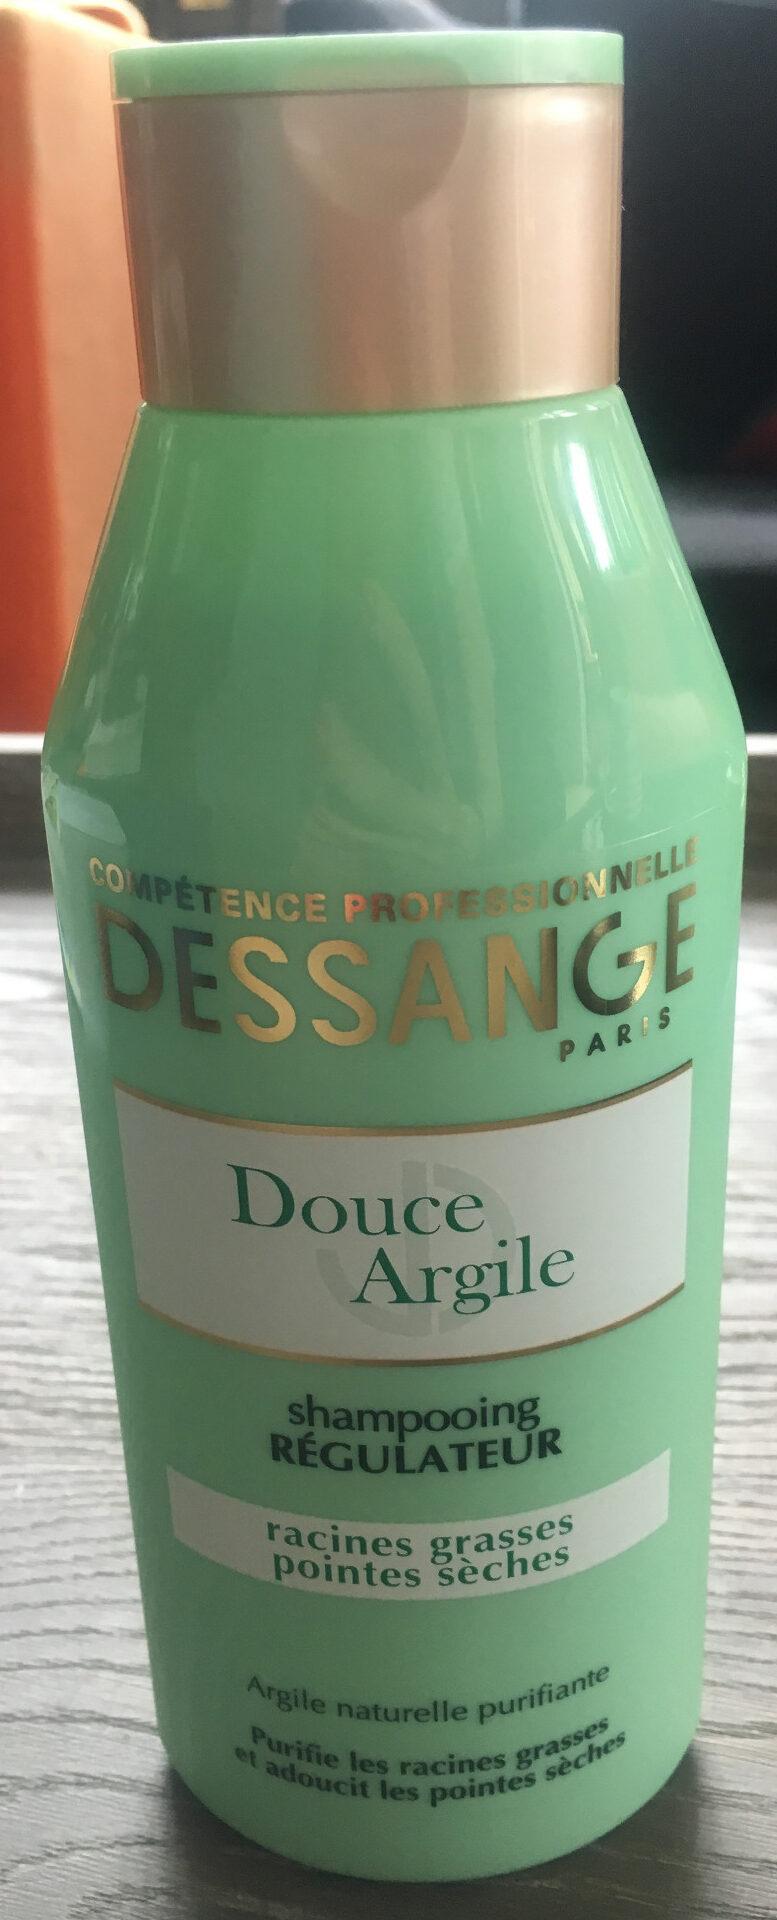 Shampooing régulateur Douce Argile - Product